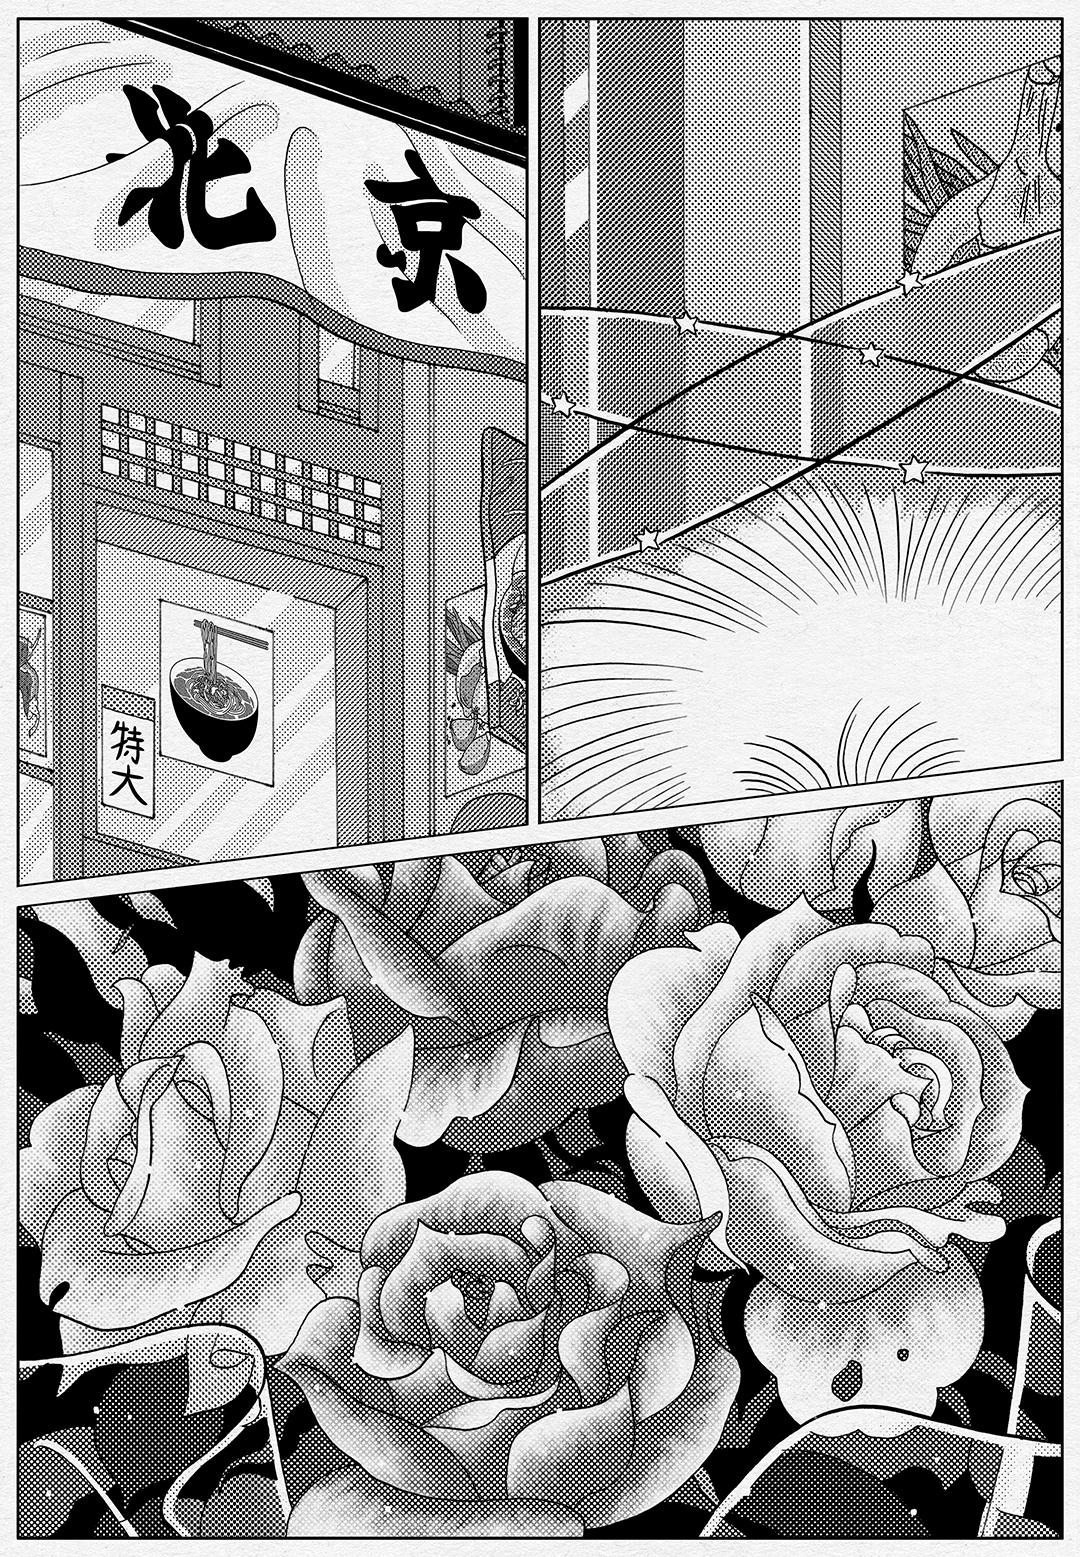 GirlsclubAsia-Illustrator-choisungmin_001